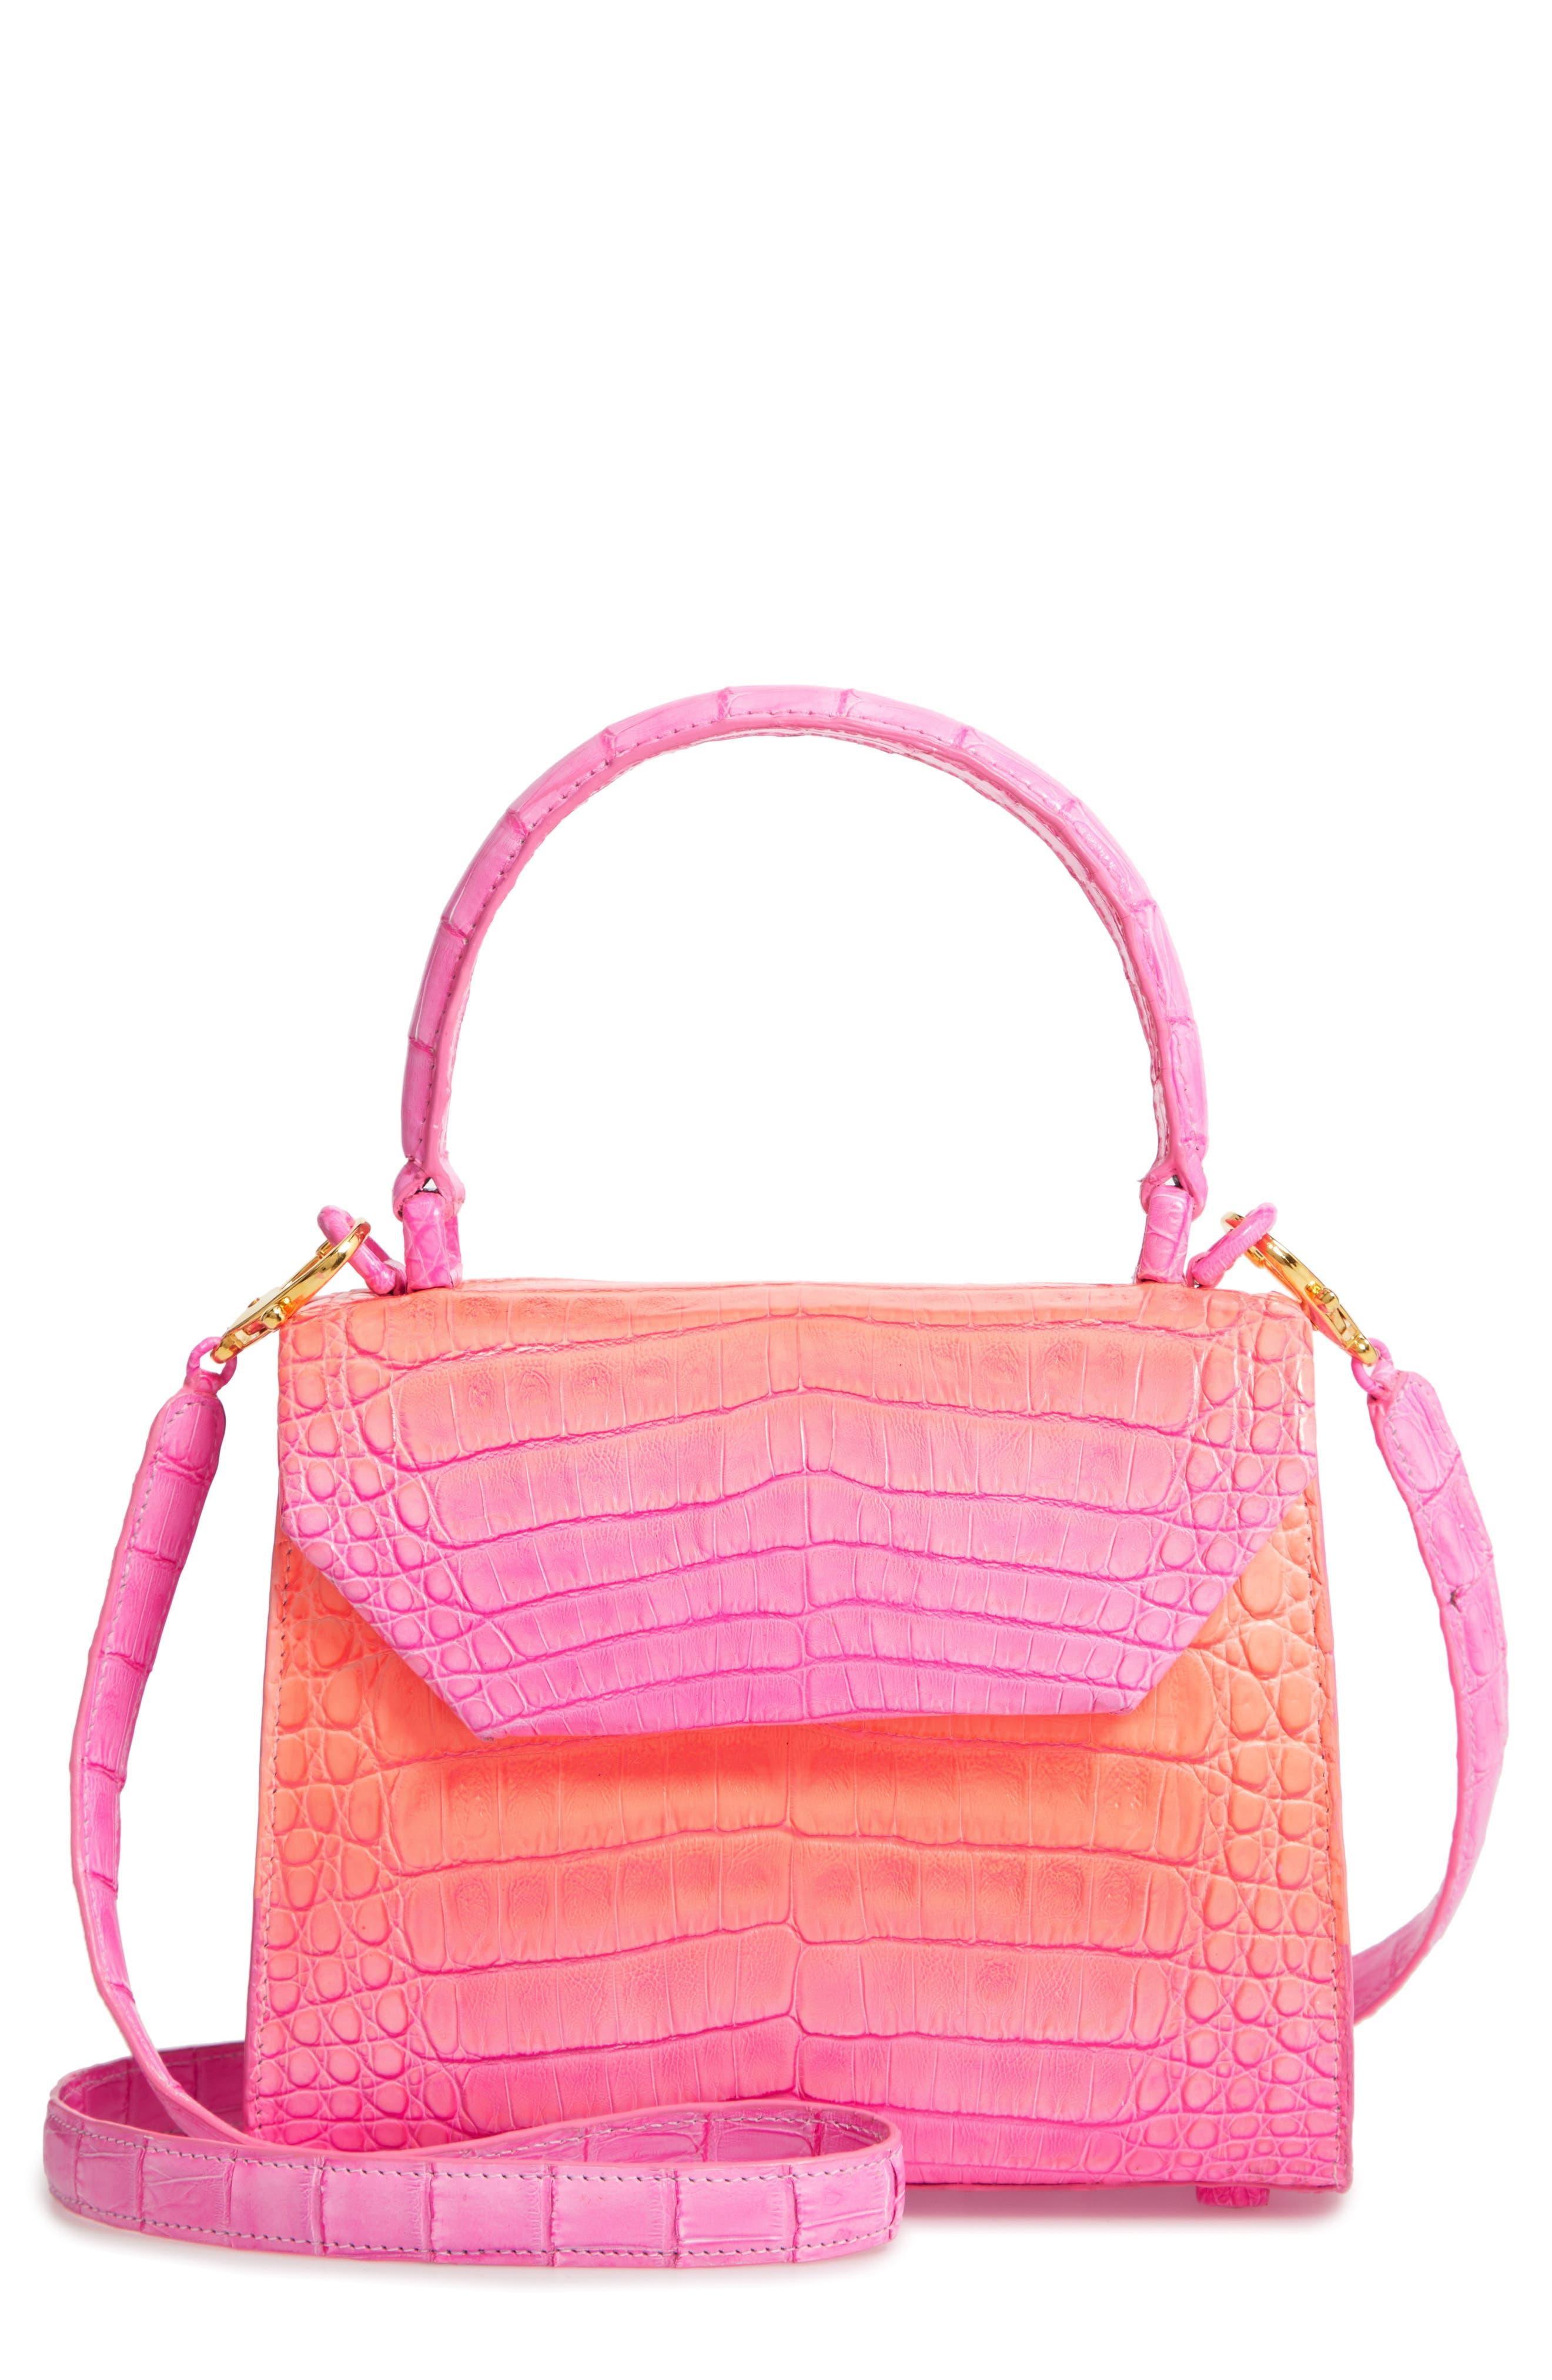 NANCY GONZALEZ Mini Lily Genuine Crocodile Crossbody Bag, Main, color, PINK DEGRADE